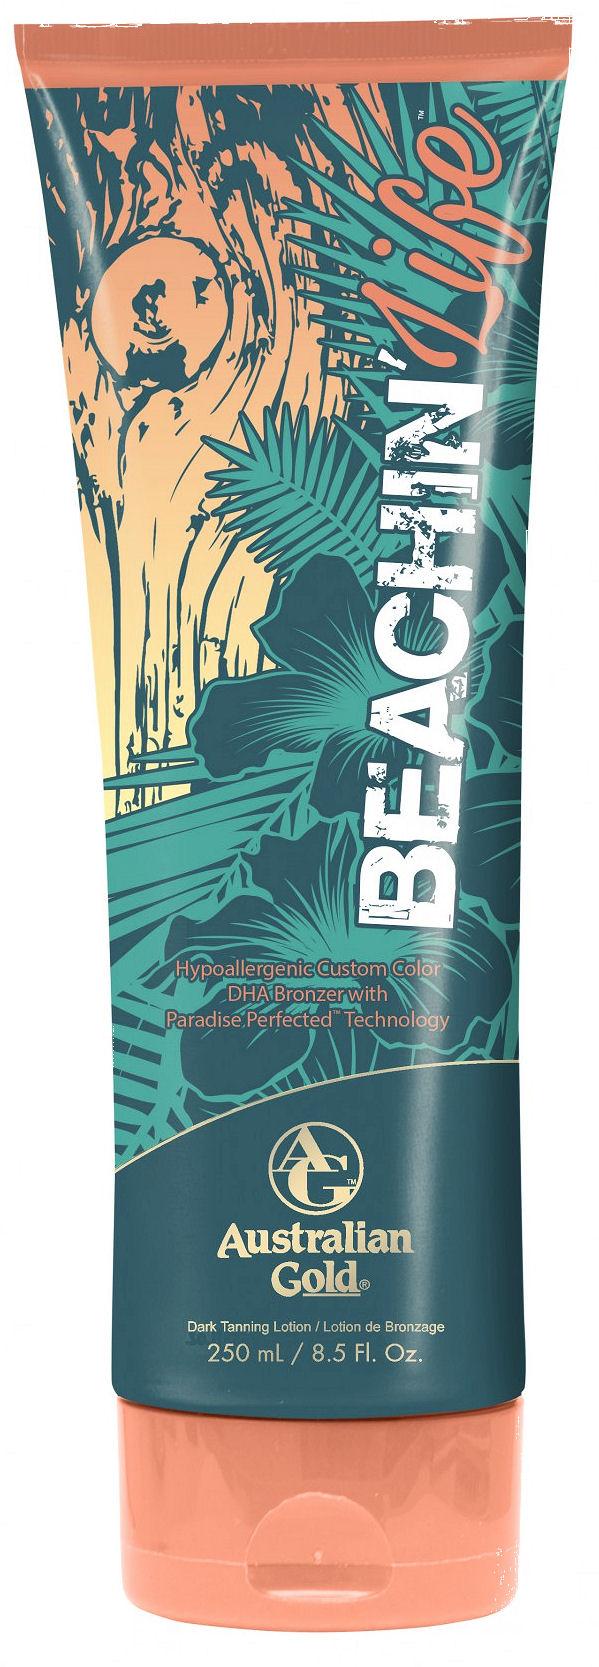 Beachin' Life™ Hypoallergenic Custom Color DHA Bronzer